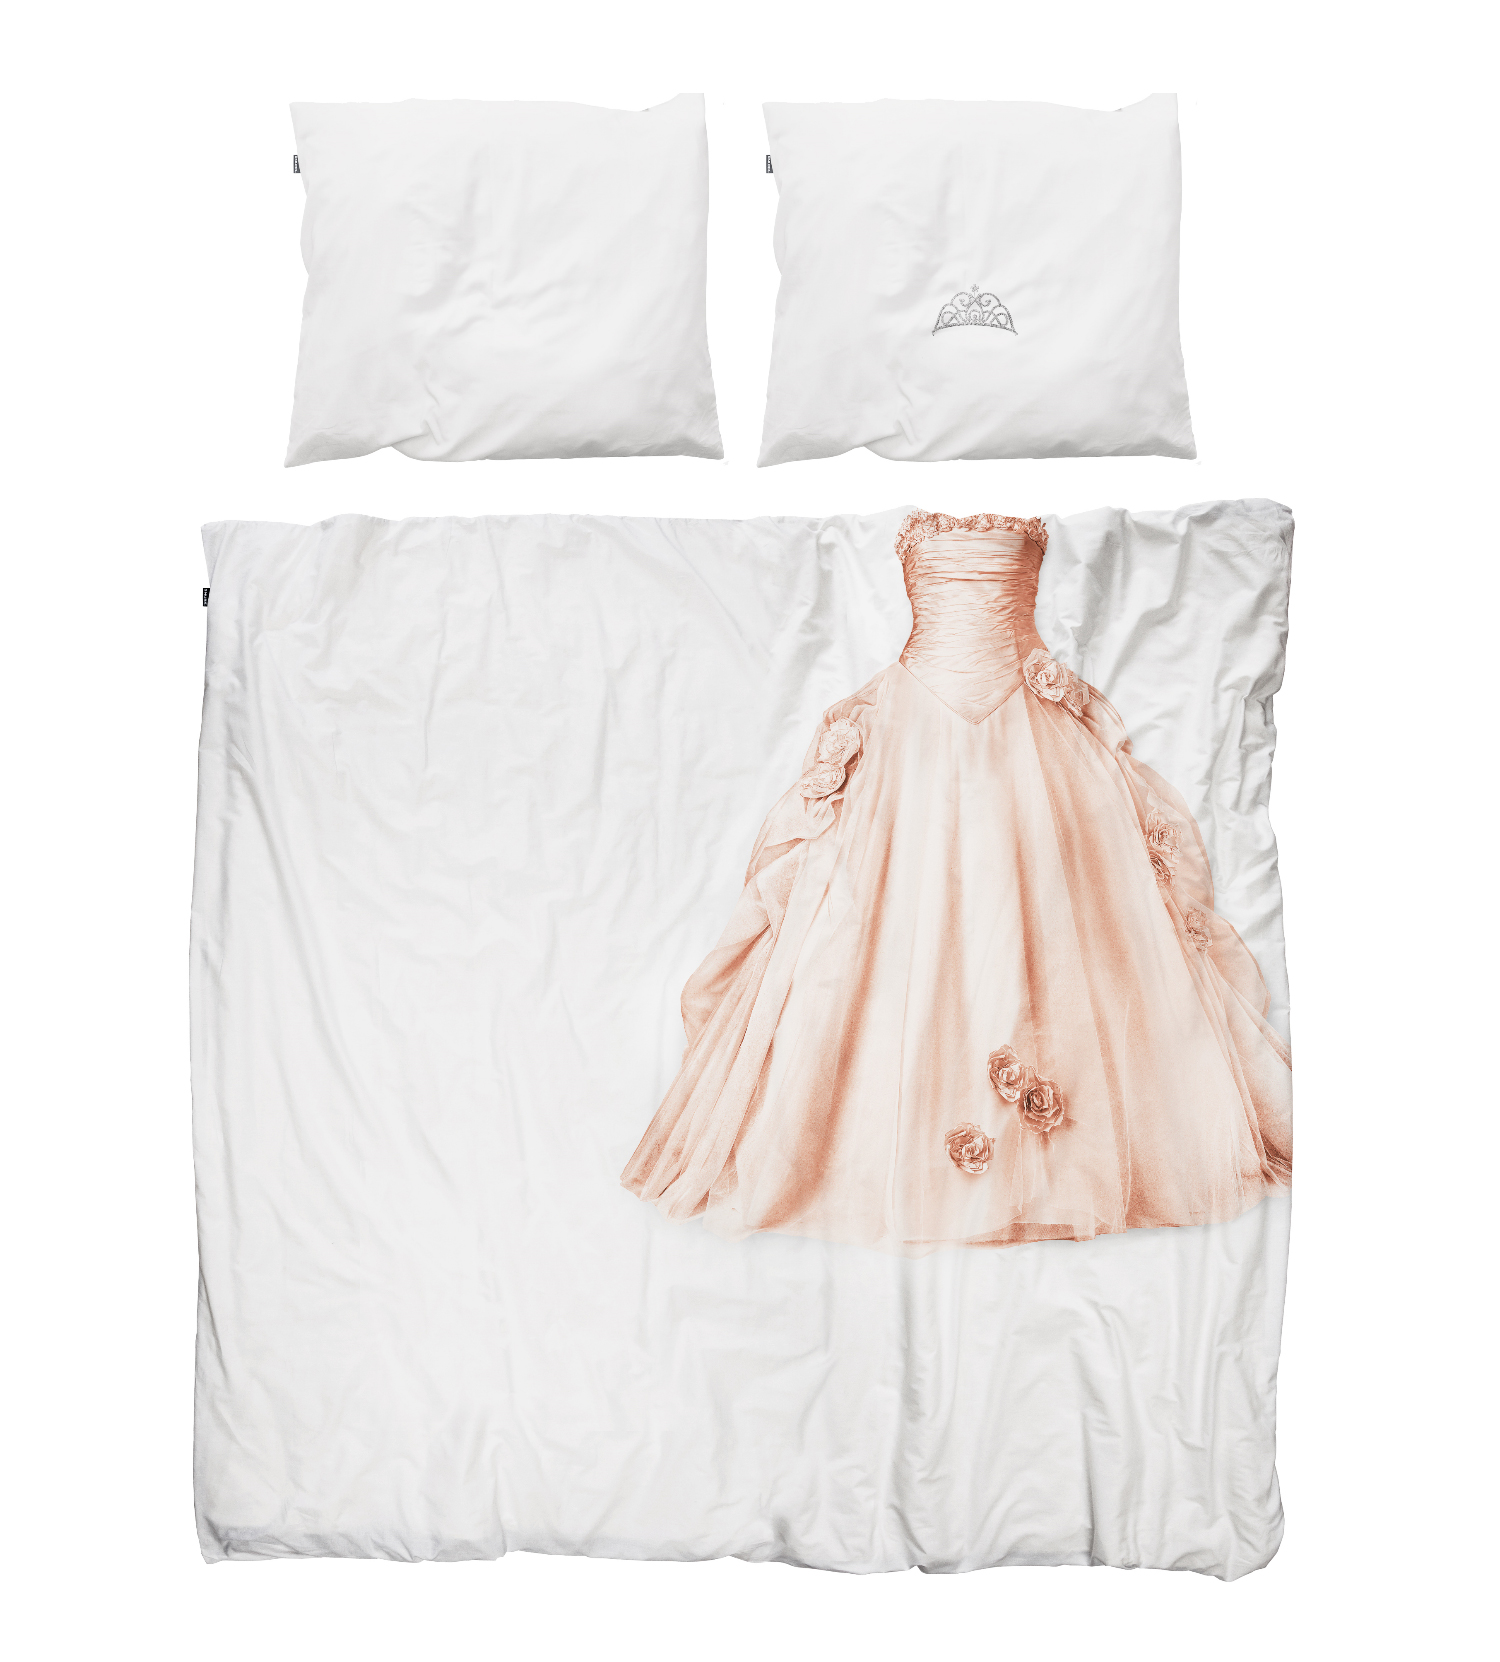 awesome-design-ideas-Sleep-like-Princess-Snurk-Bedding-3